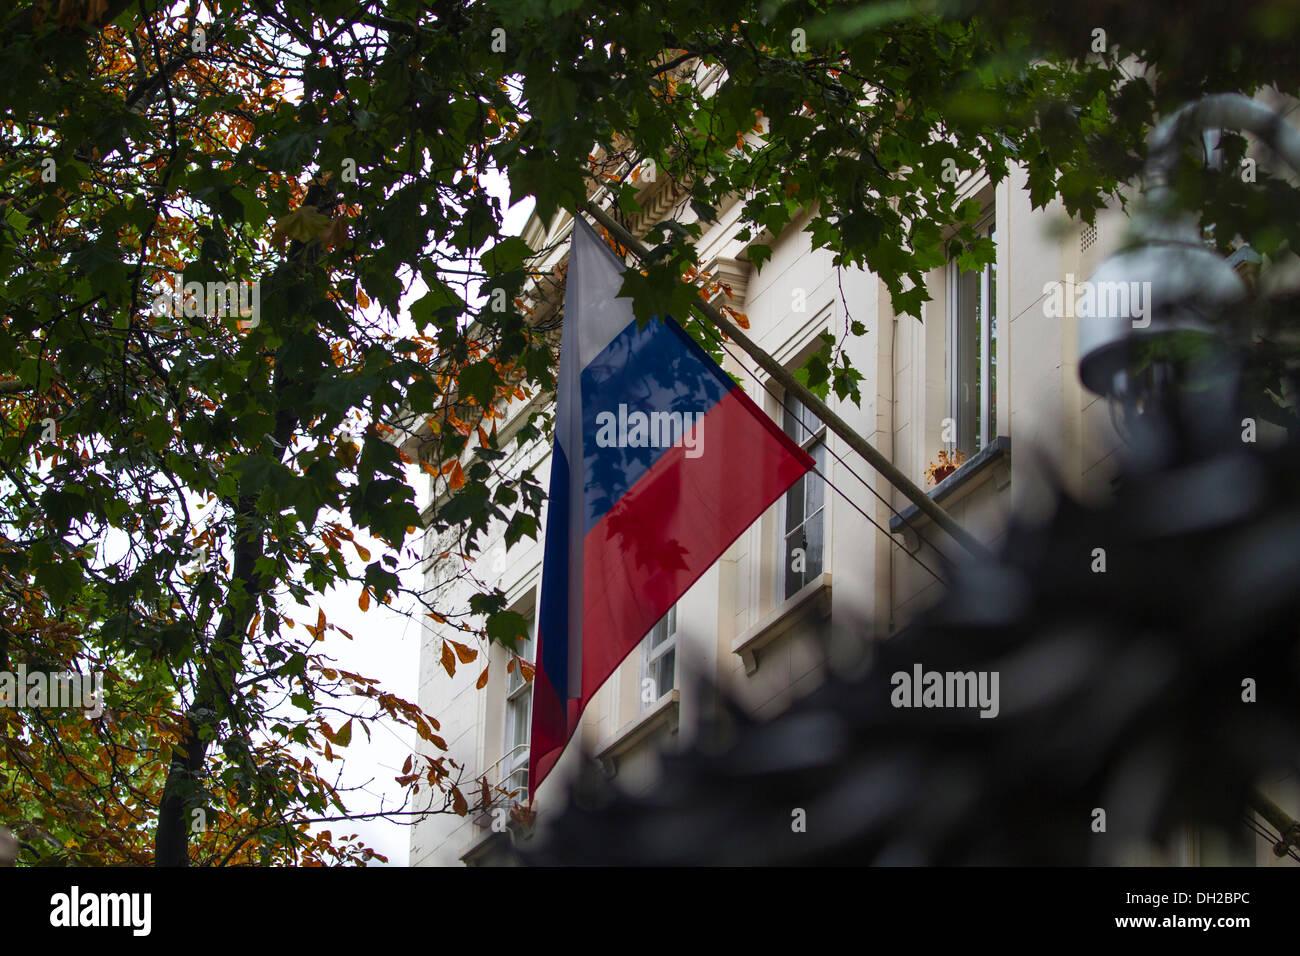 Flag flies outside Russian Embassy, London, UK - Stock Image